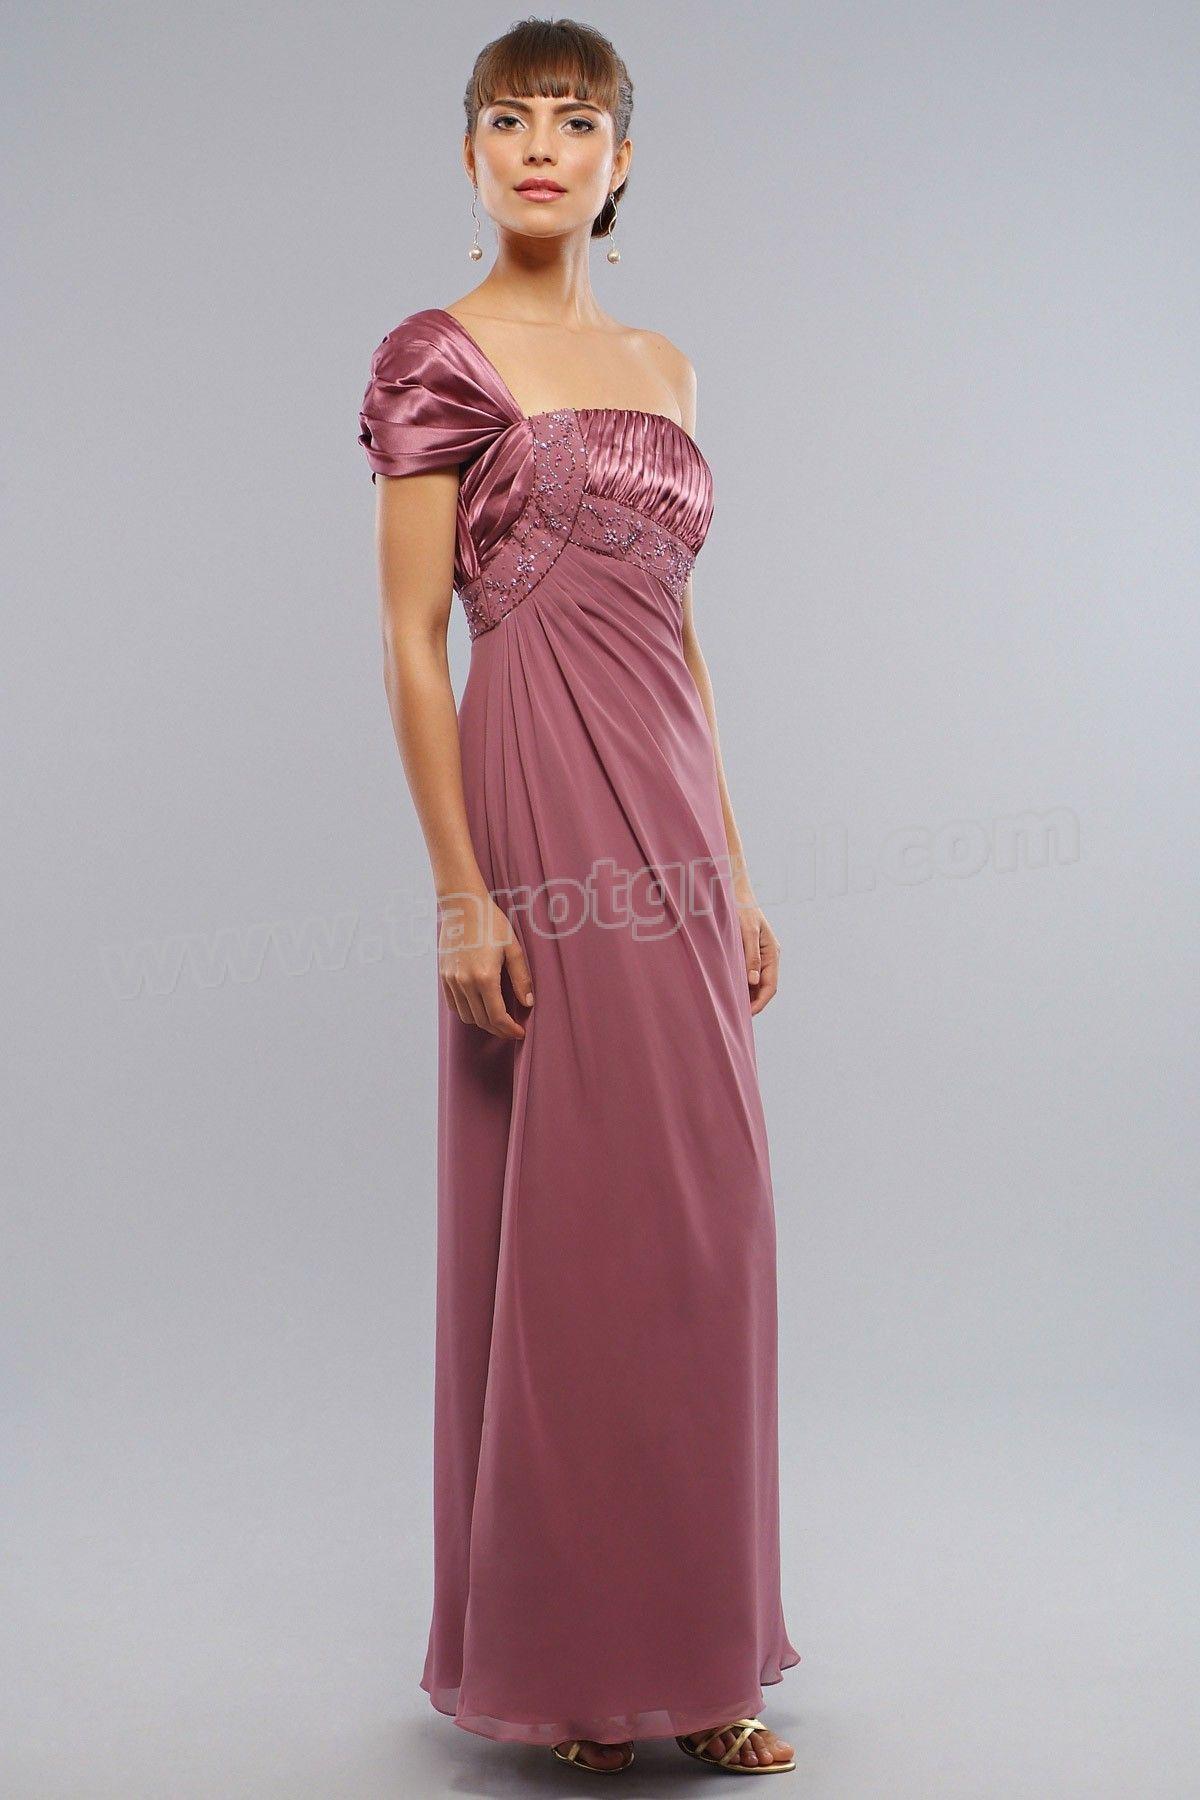 Chiffoncharmeuse strapless oneshoulder long prom dress prom